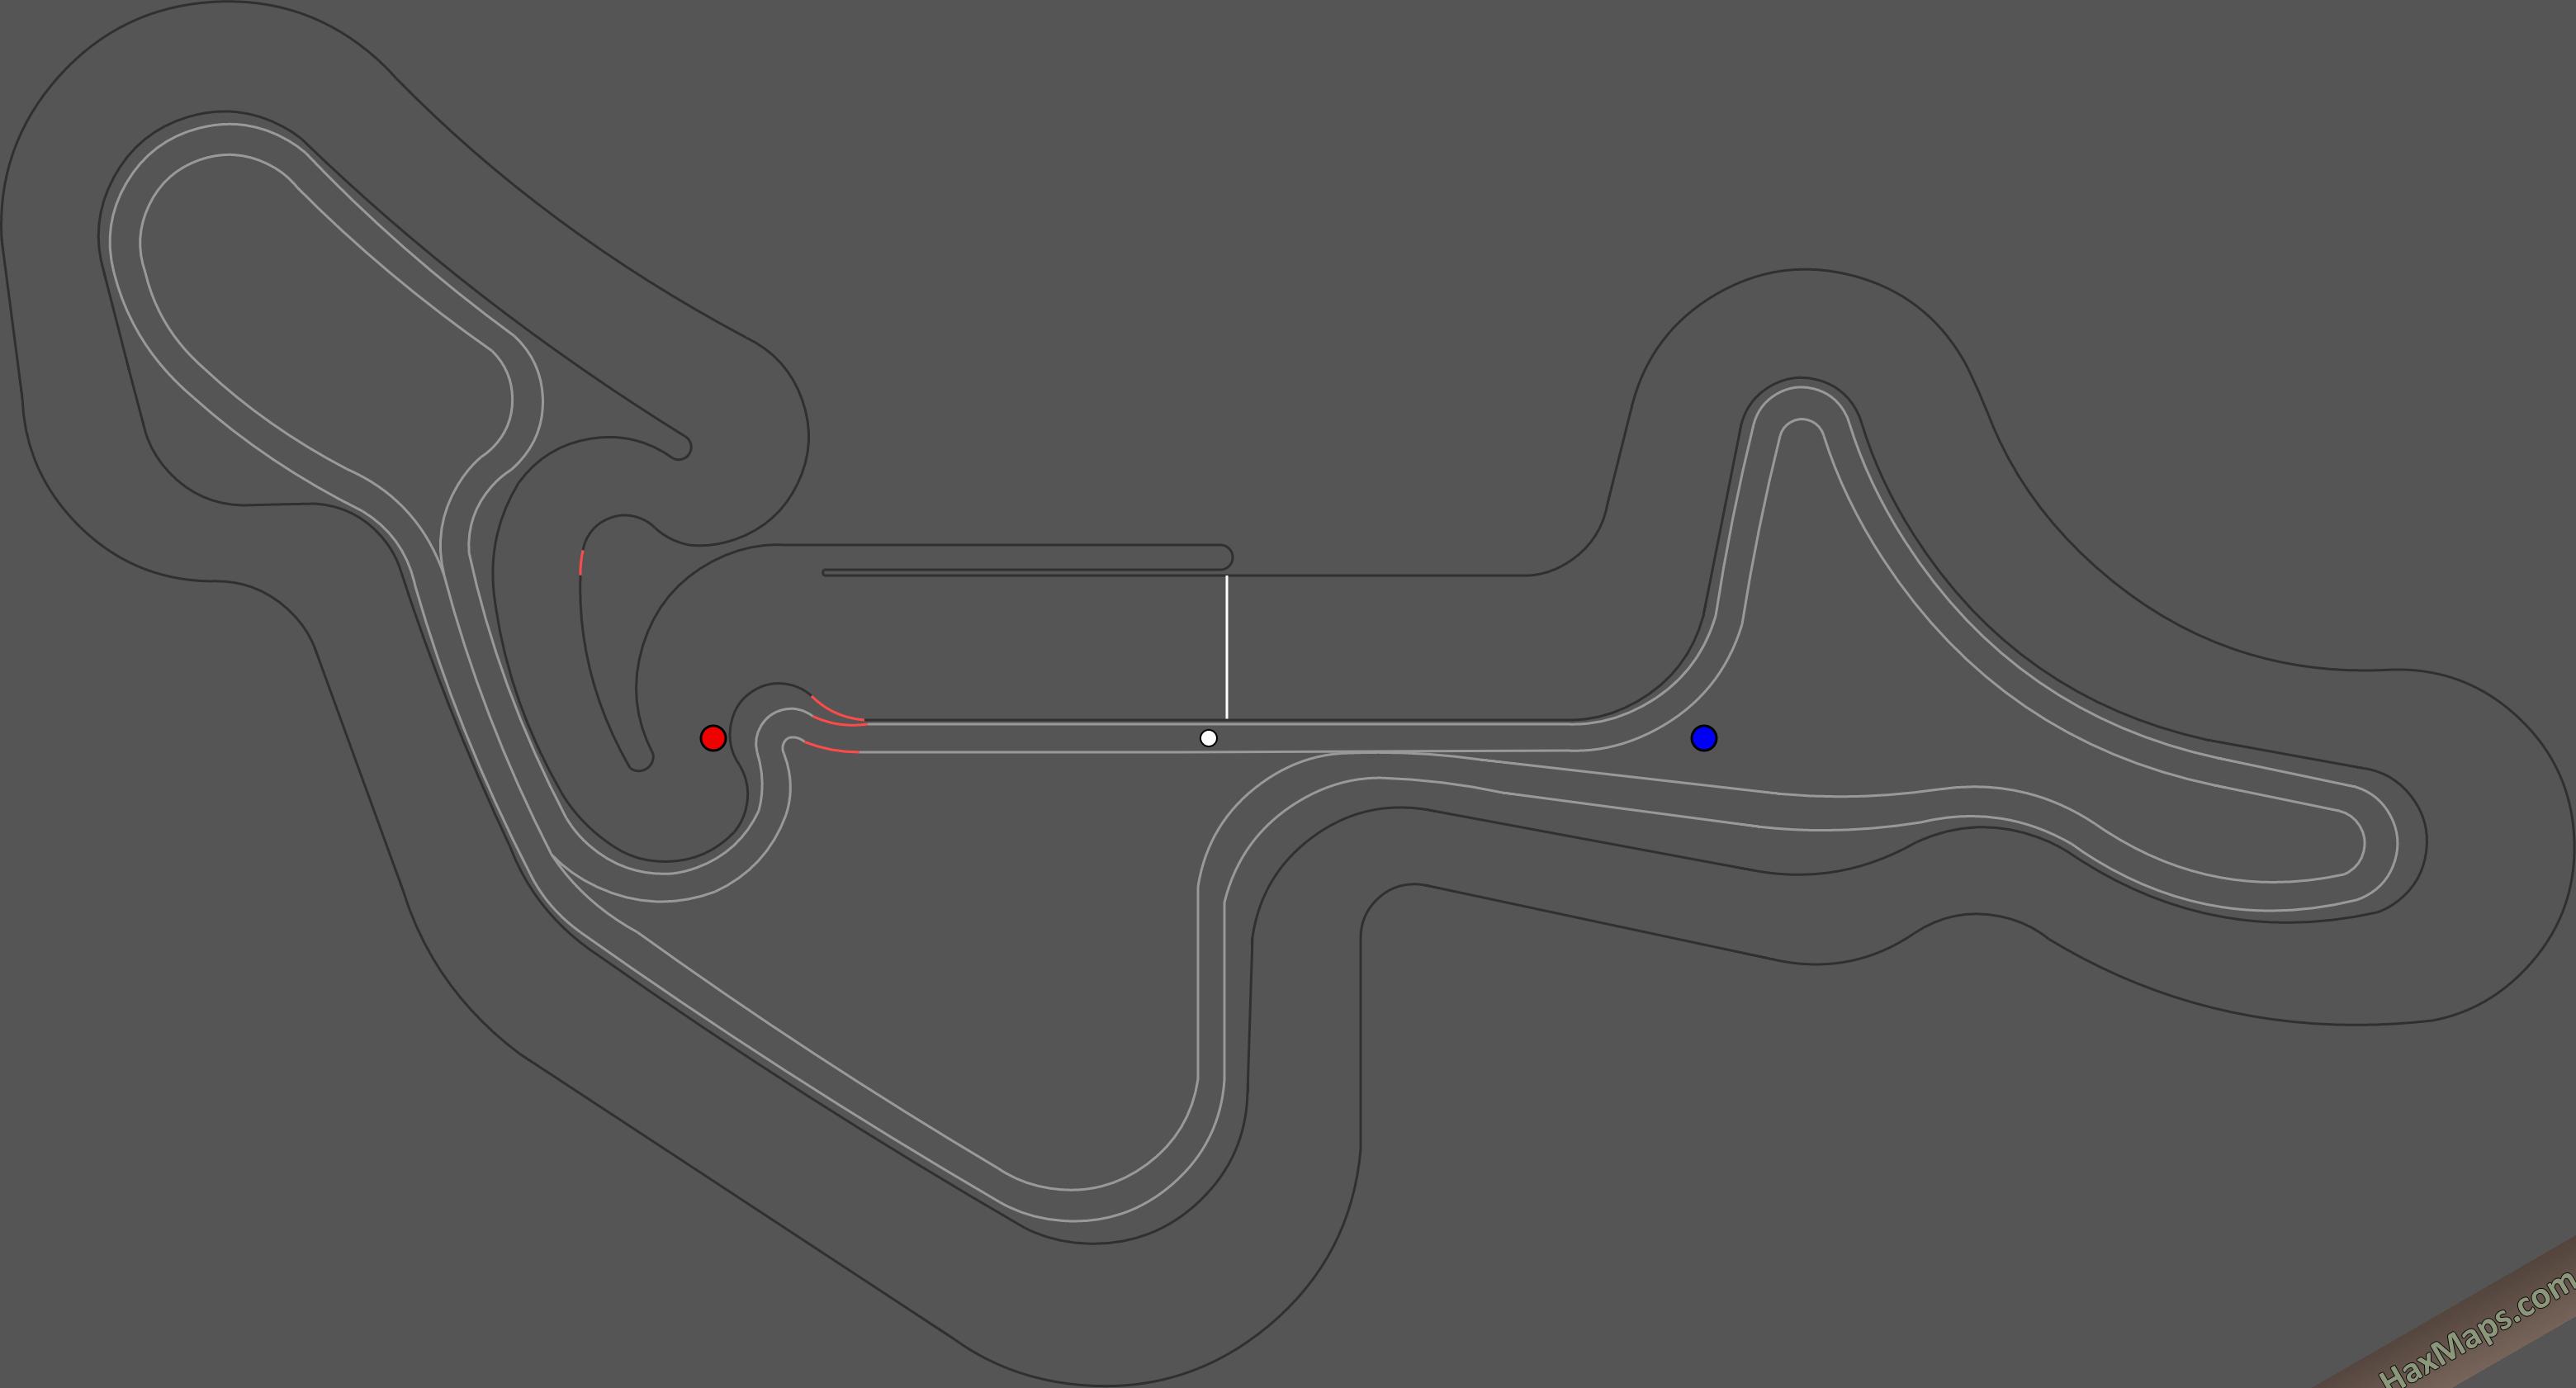 hax ball maps | Park City (K-120, HS-134)